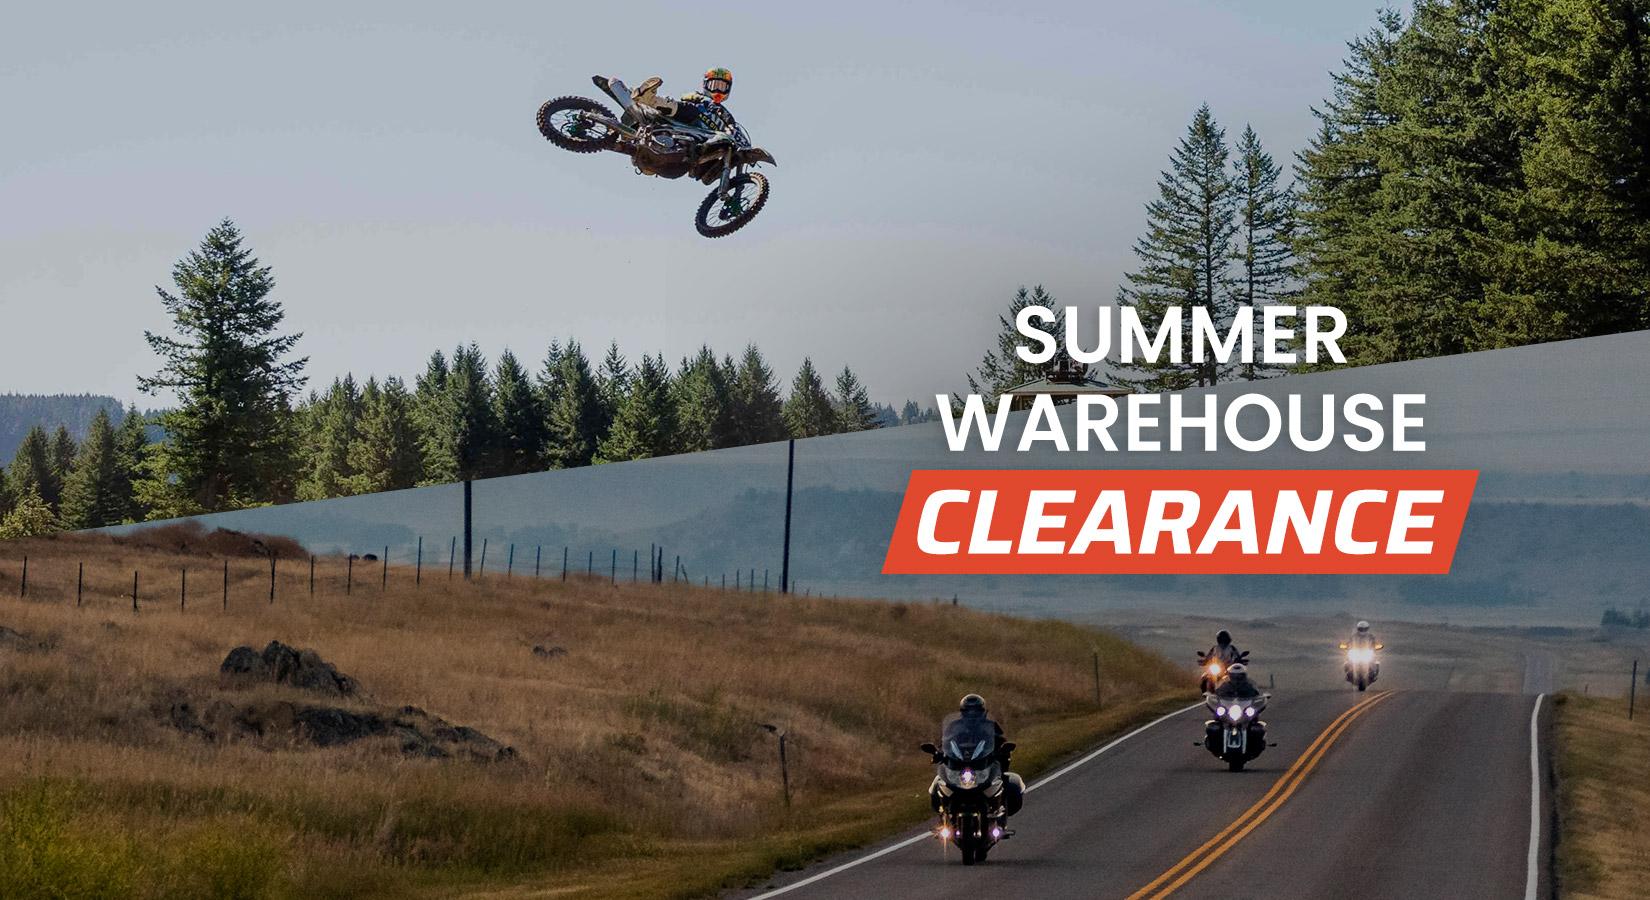 SUMMER WAREHOUSE CLEARANCE